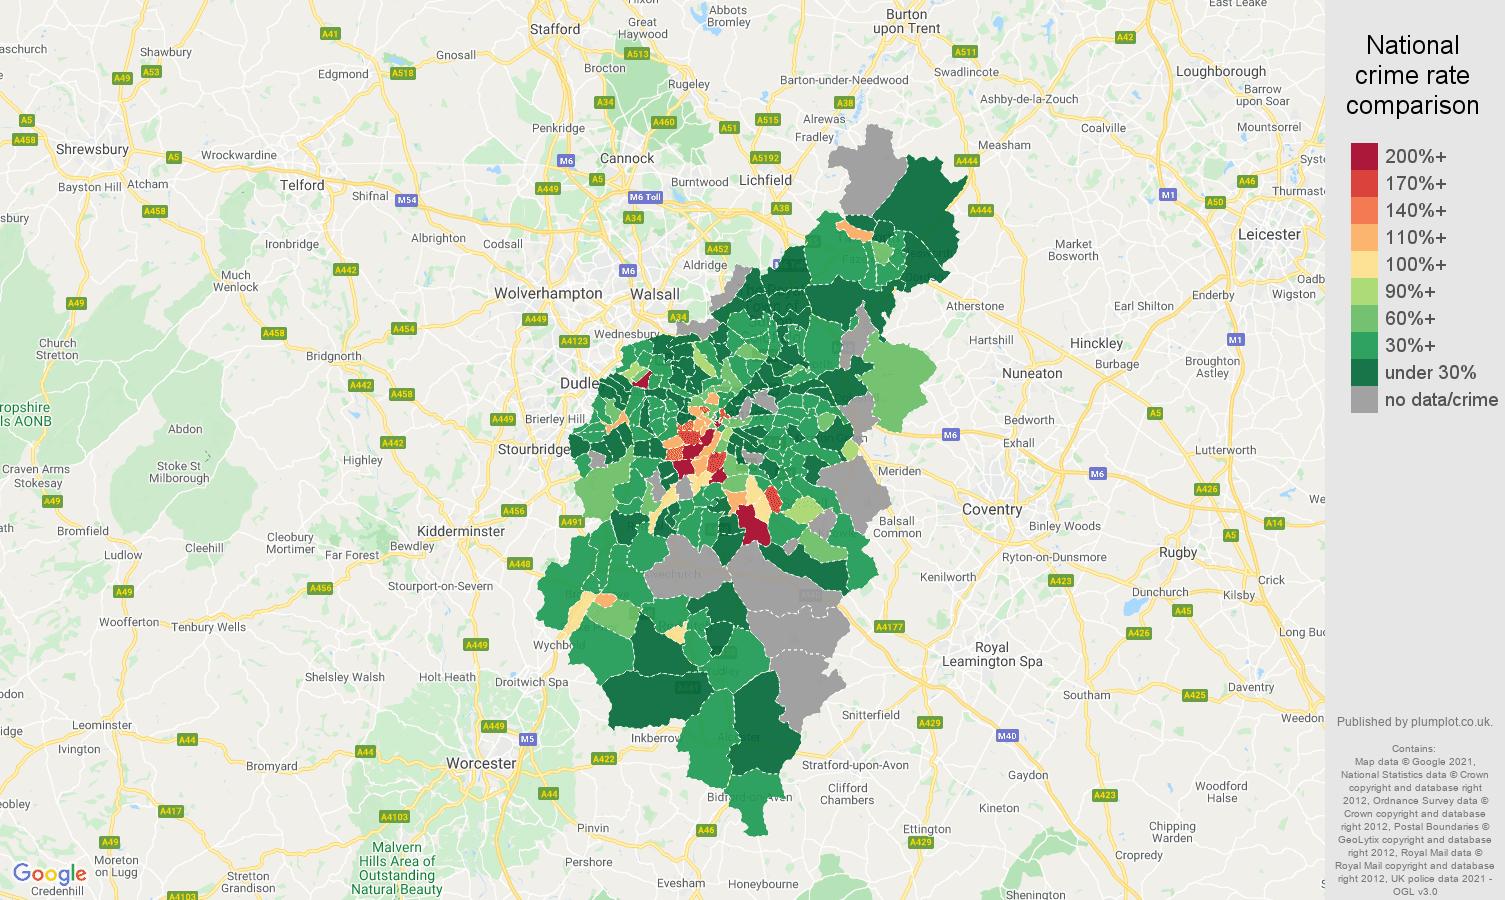 Birmingham bicycle theft crime rate comparison map